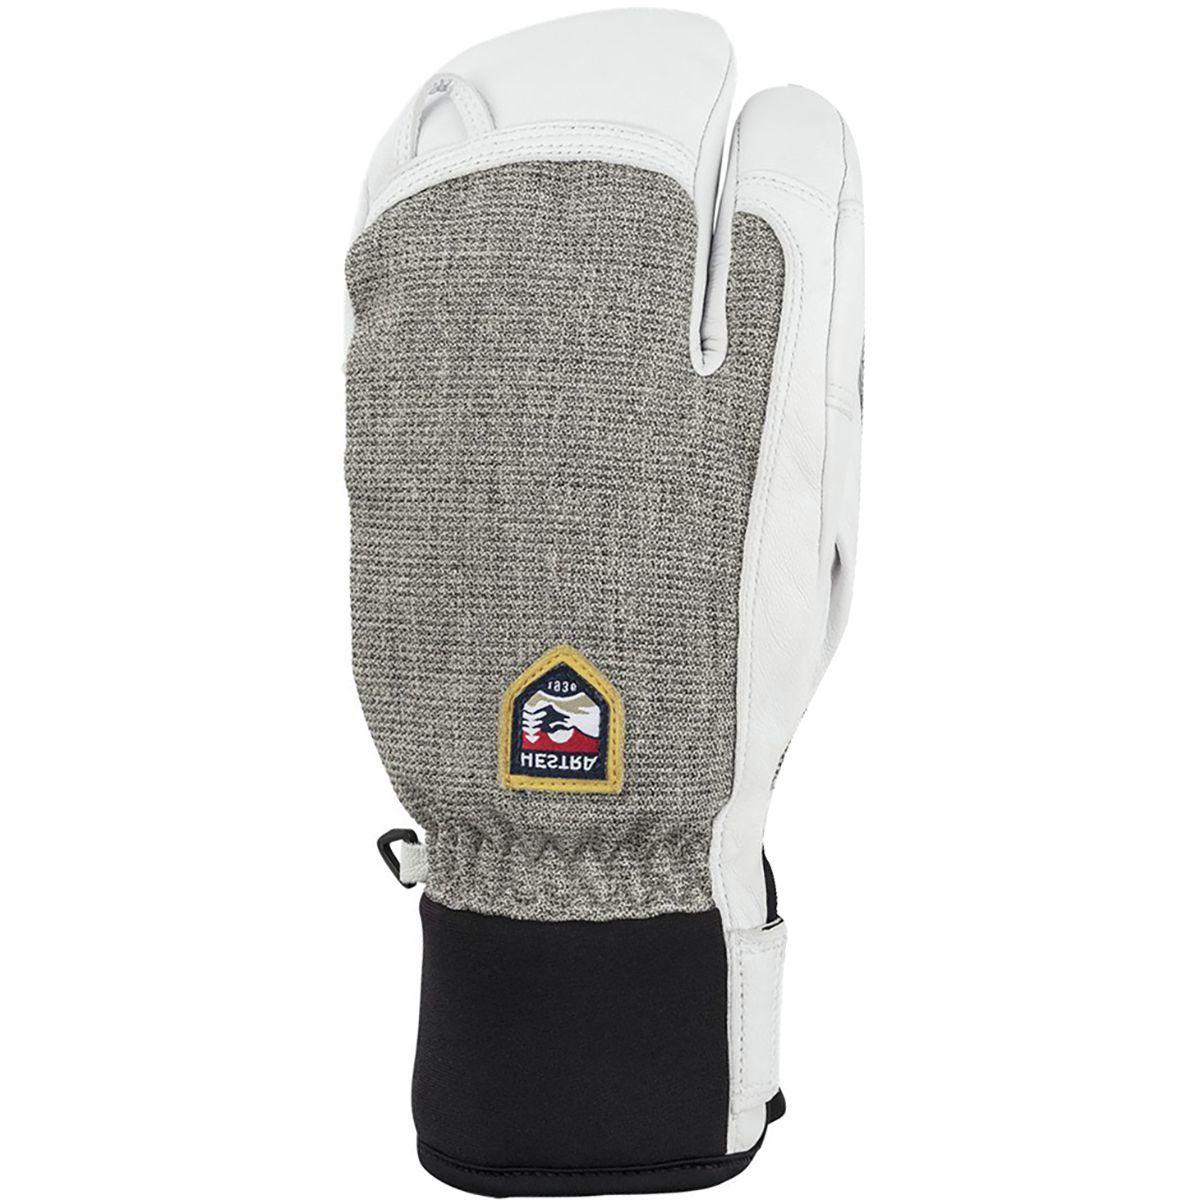 Hestra Army Leather Patrol 3-Finger Glove - Men's